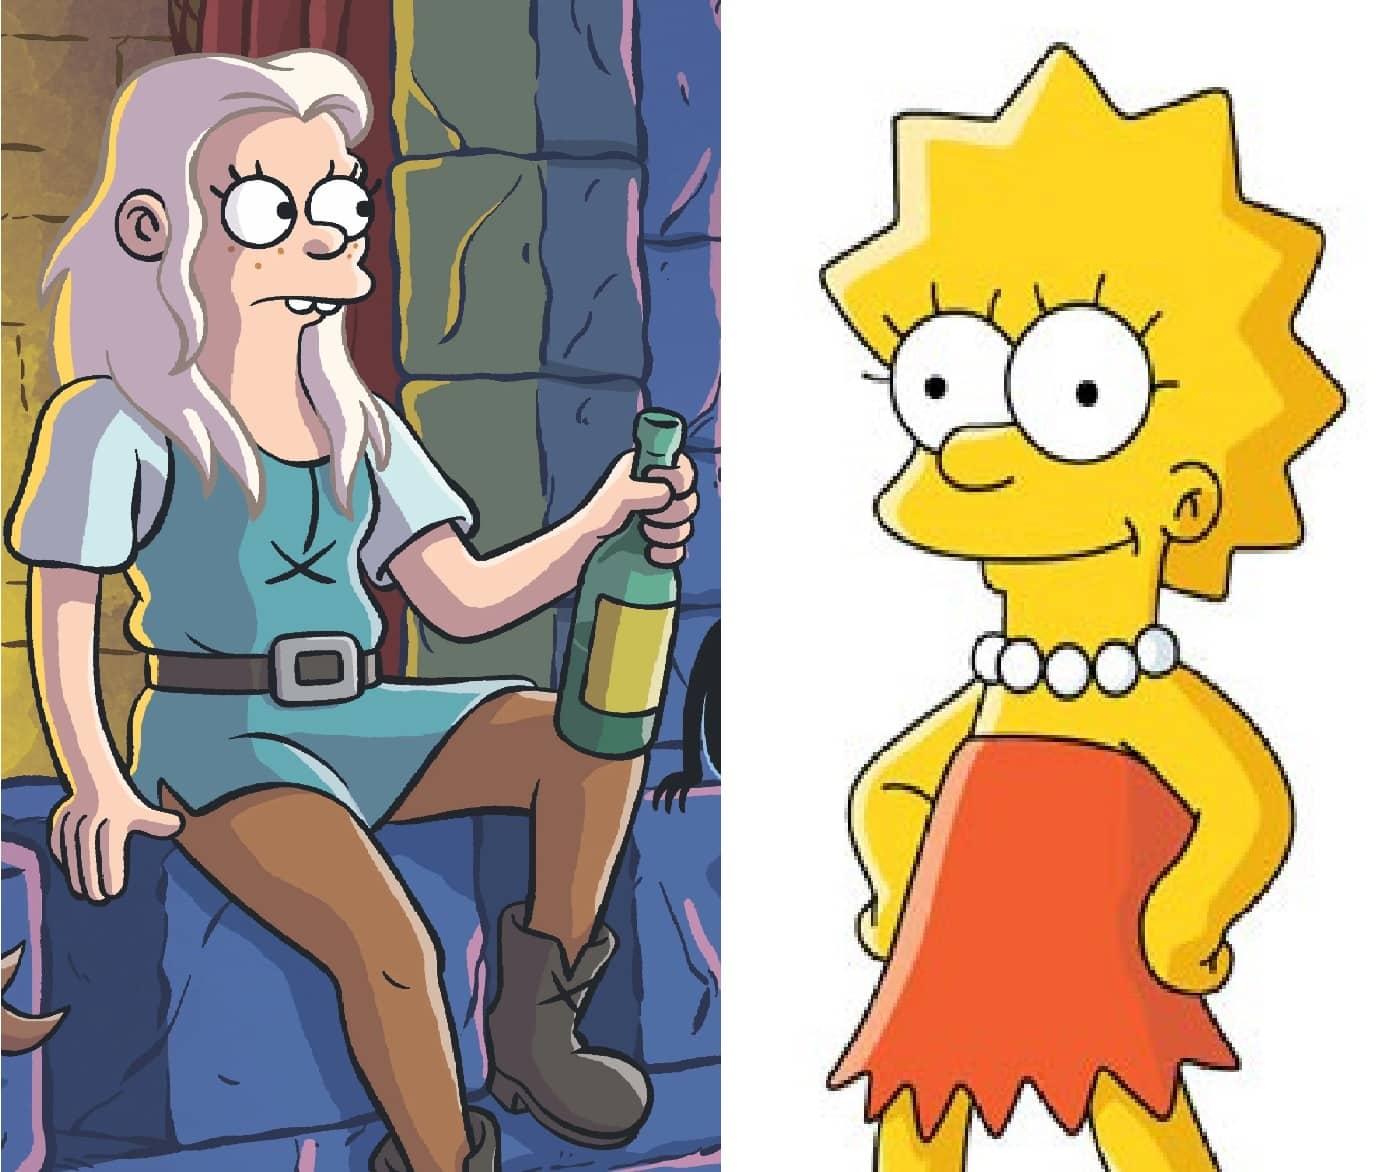 Bean and Lisa